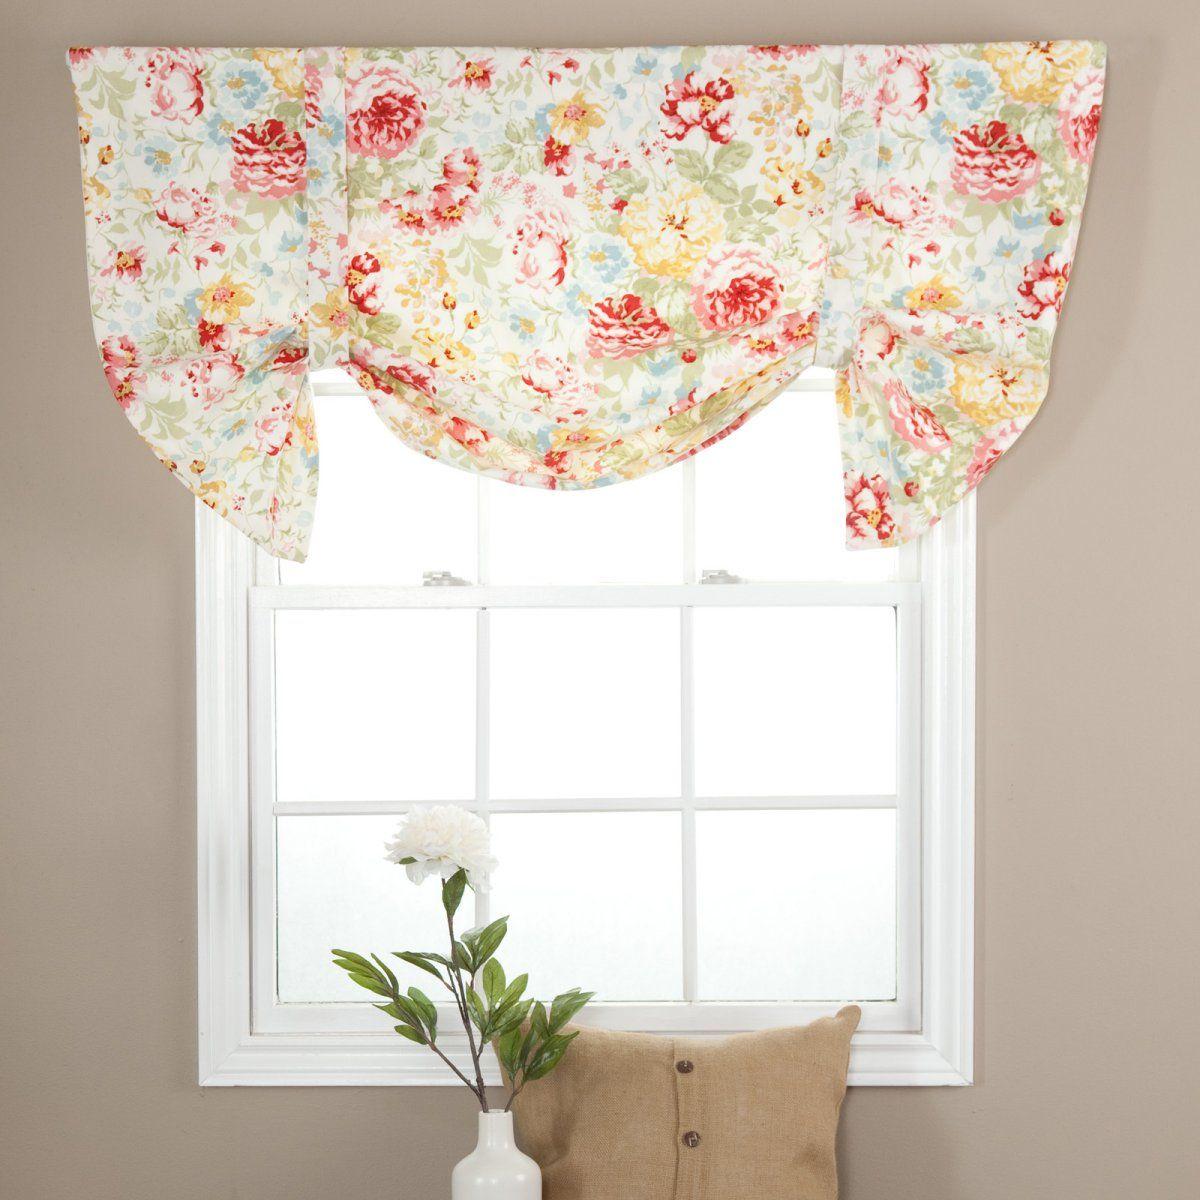 Tie Up Kitchen Curtains: Ellis Curtain Monica Lined Duchess Tie Up Valance